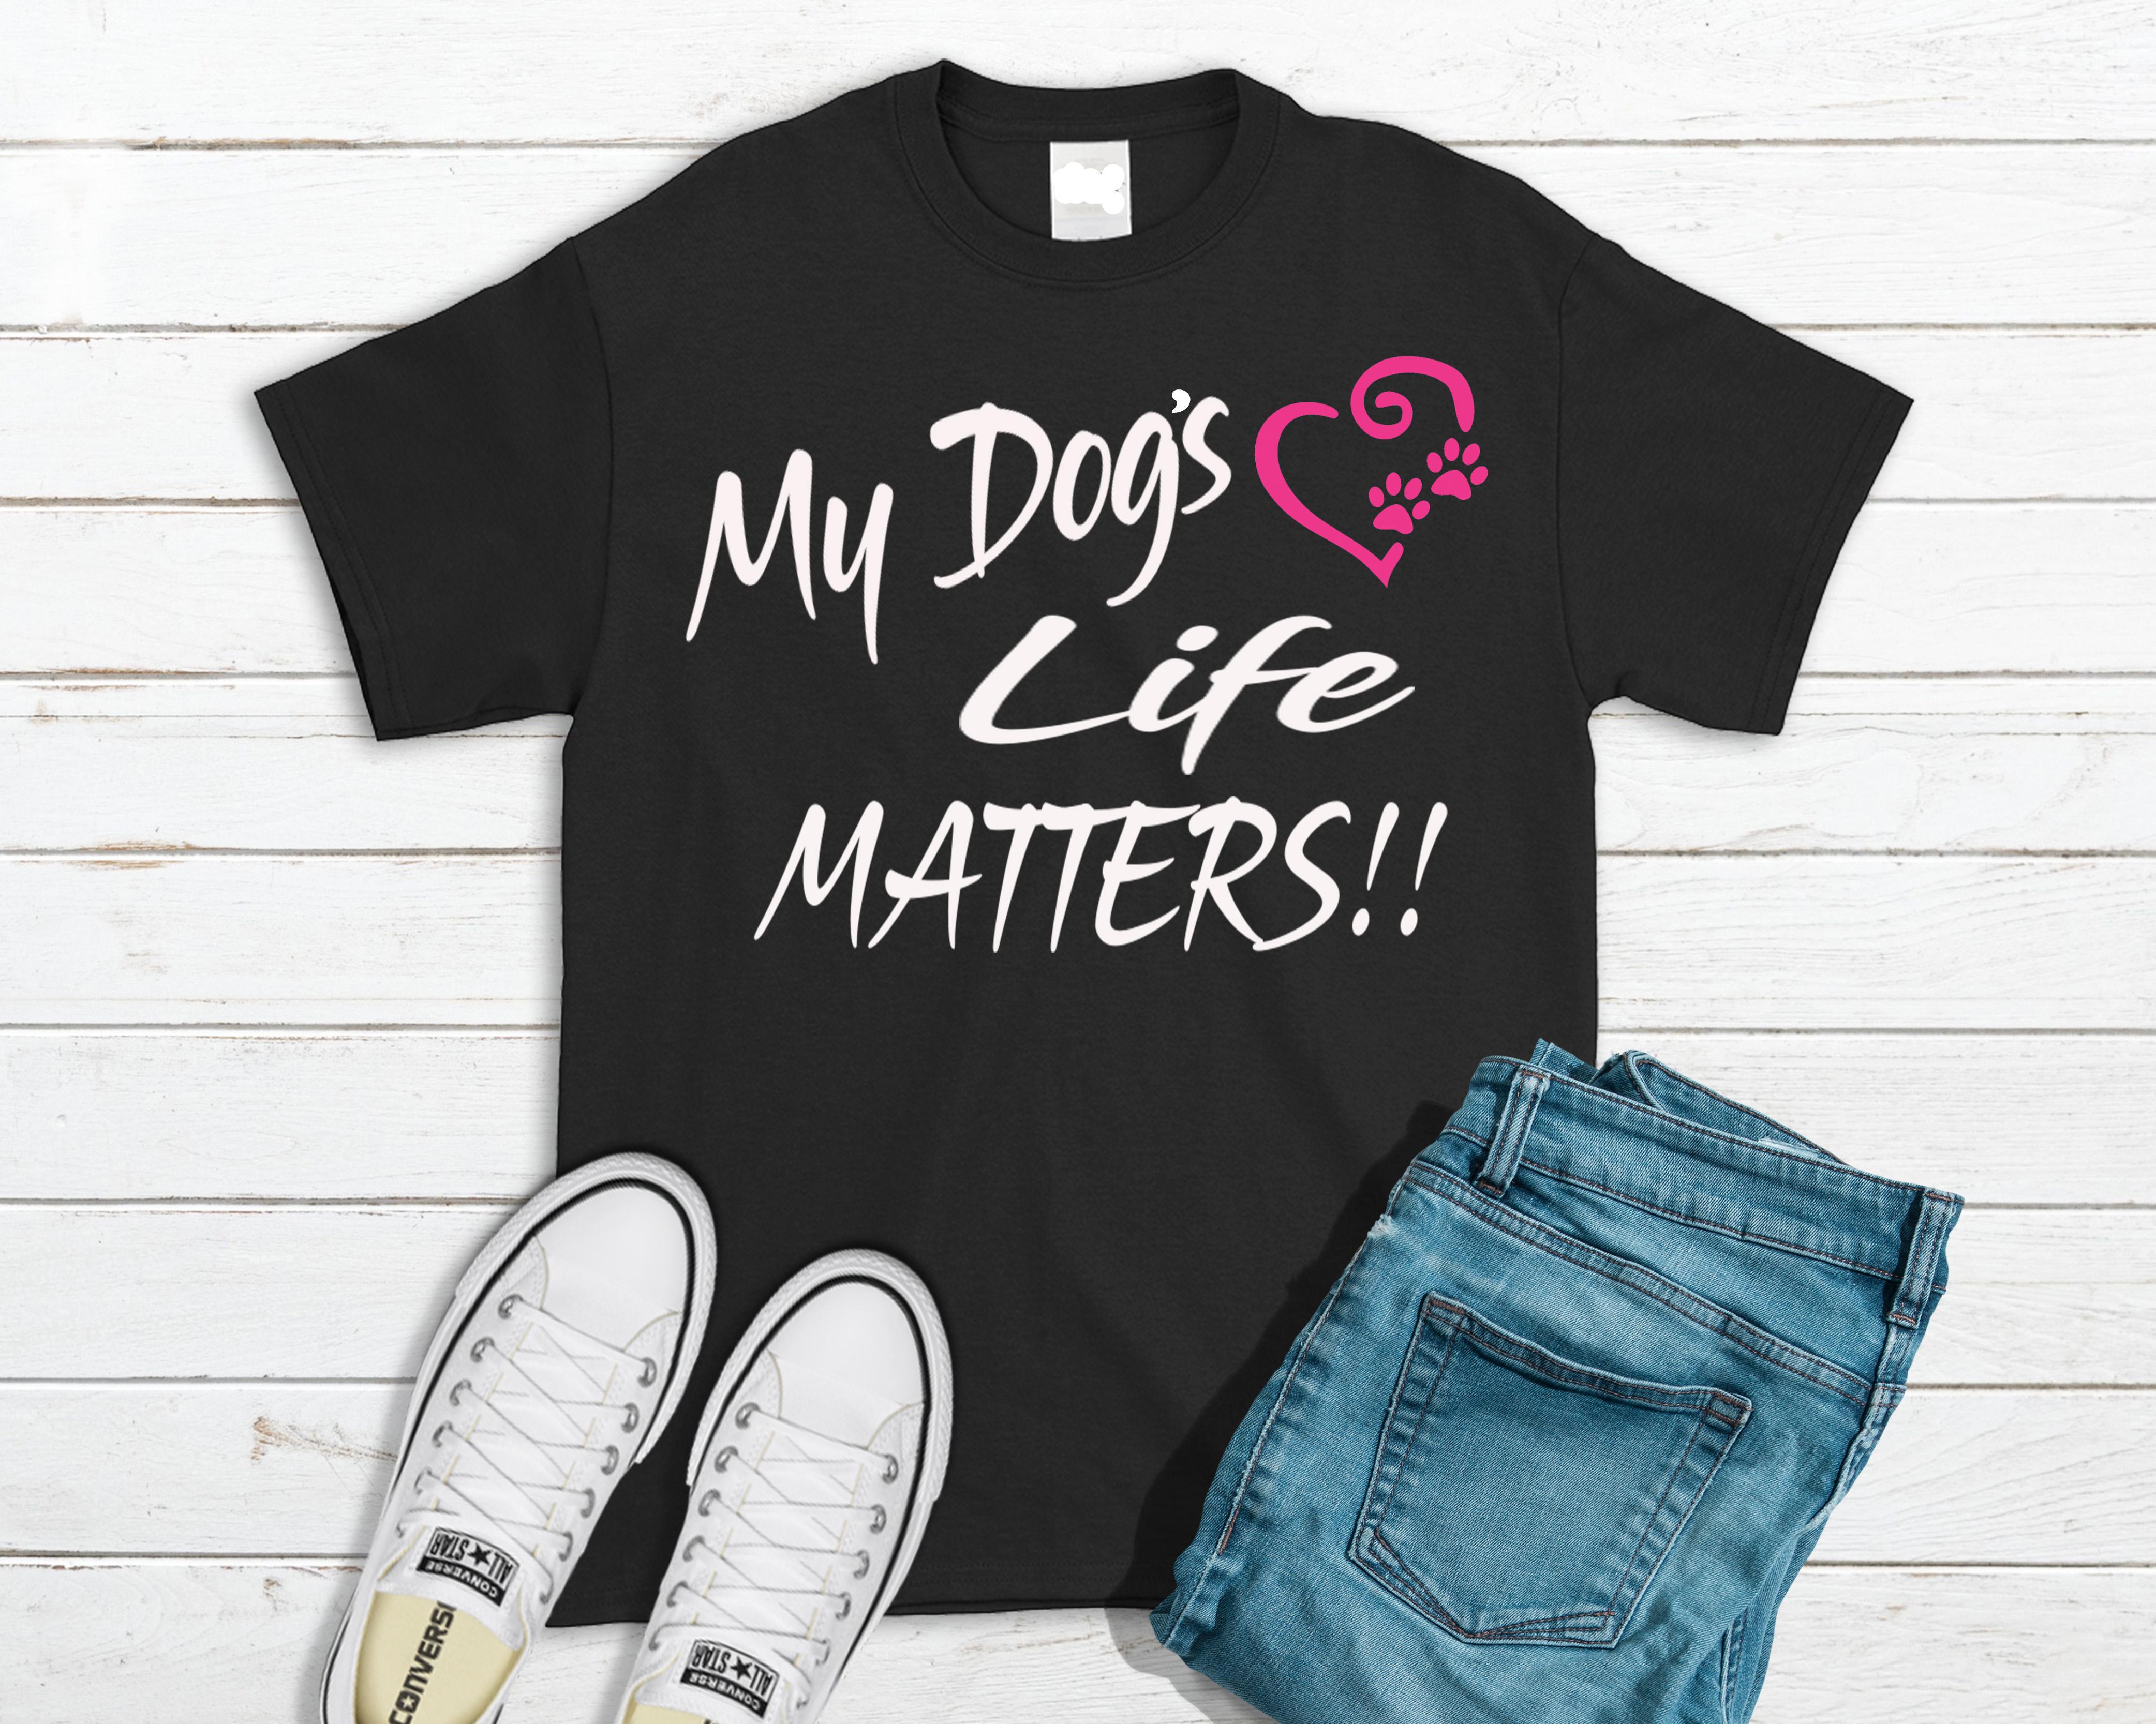 MY DOGS LIFE MATTERS.jpg